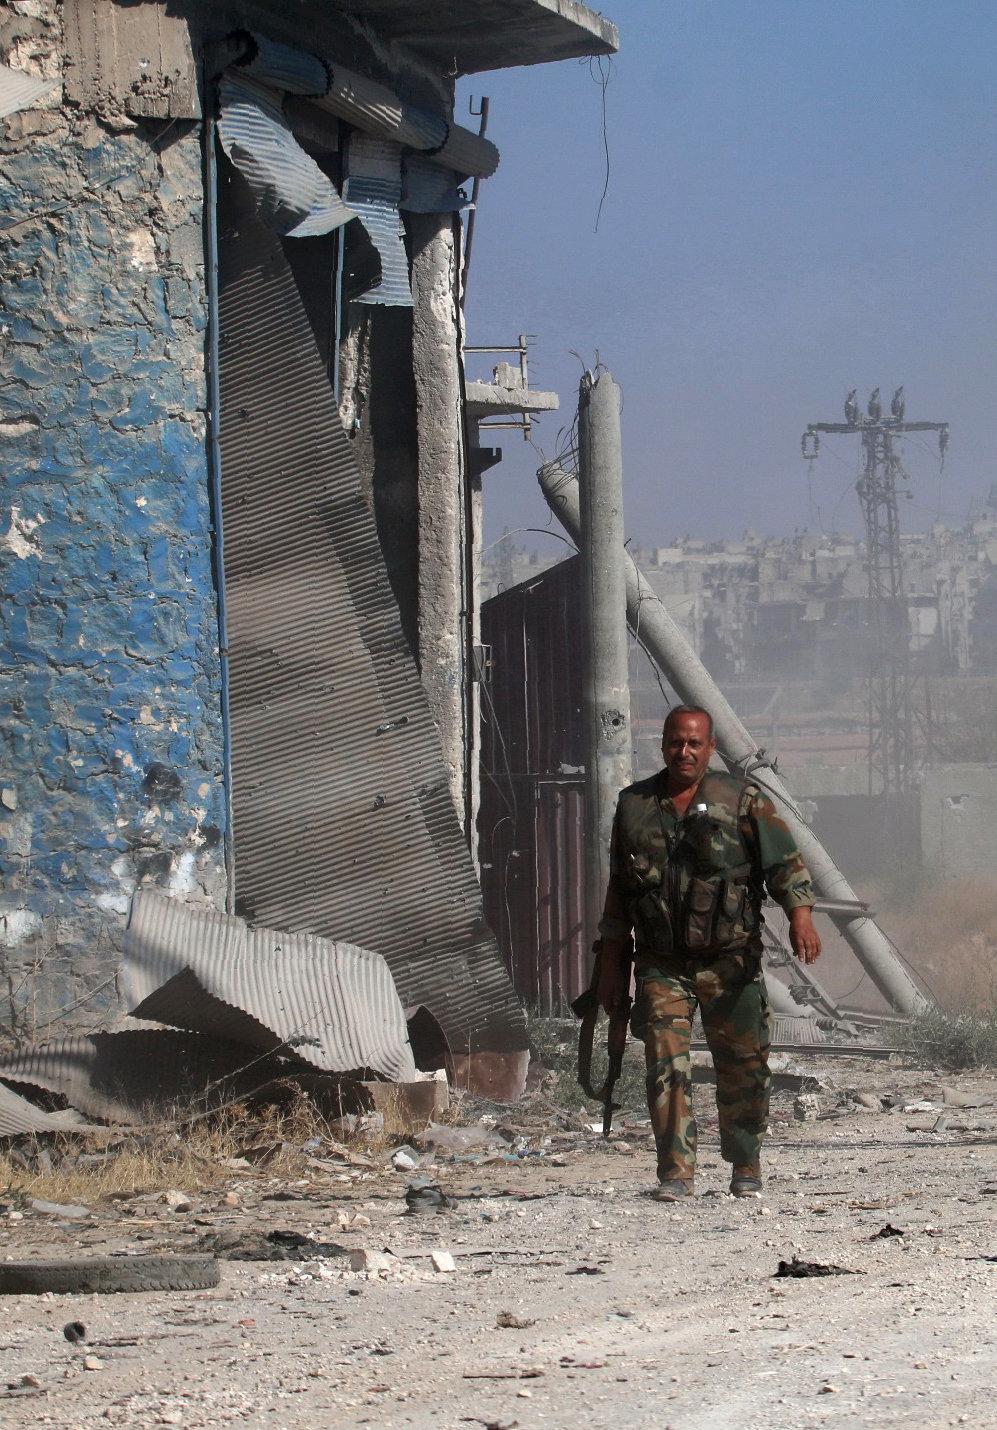 H Δαμασκός κατηγορεί τις ΗΠΑ για πλήγμα κατά θέσεων του στρατού